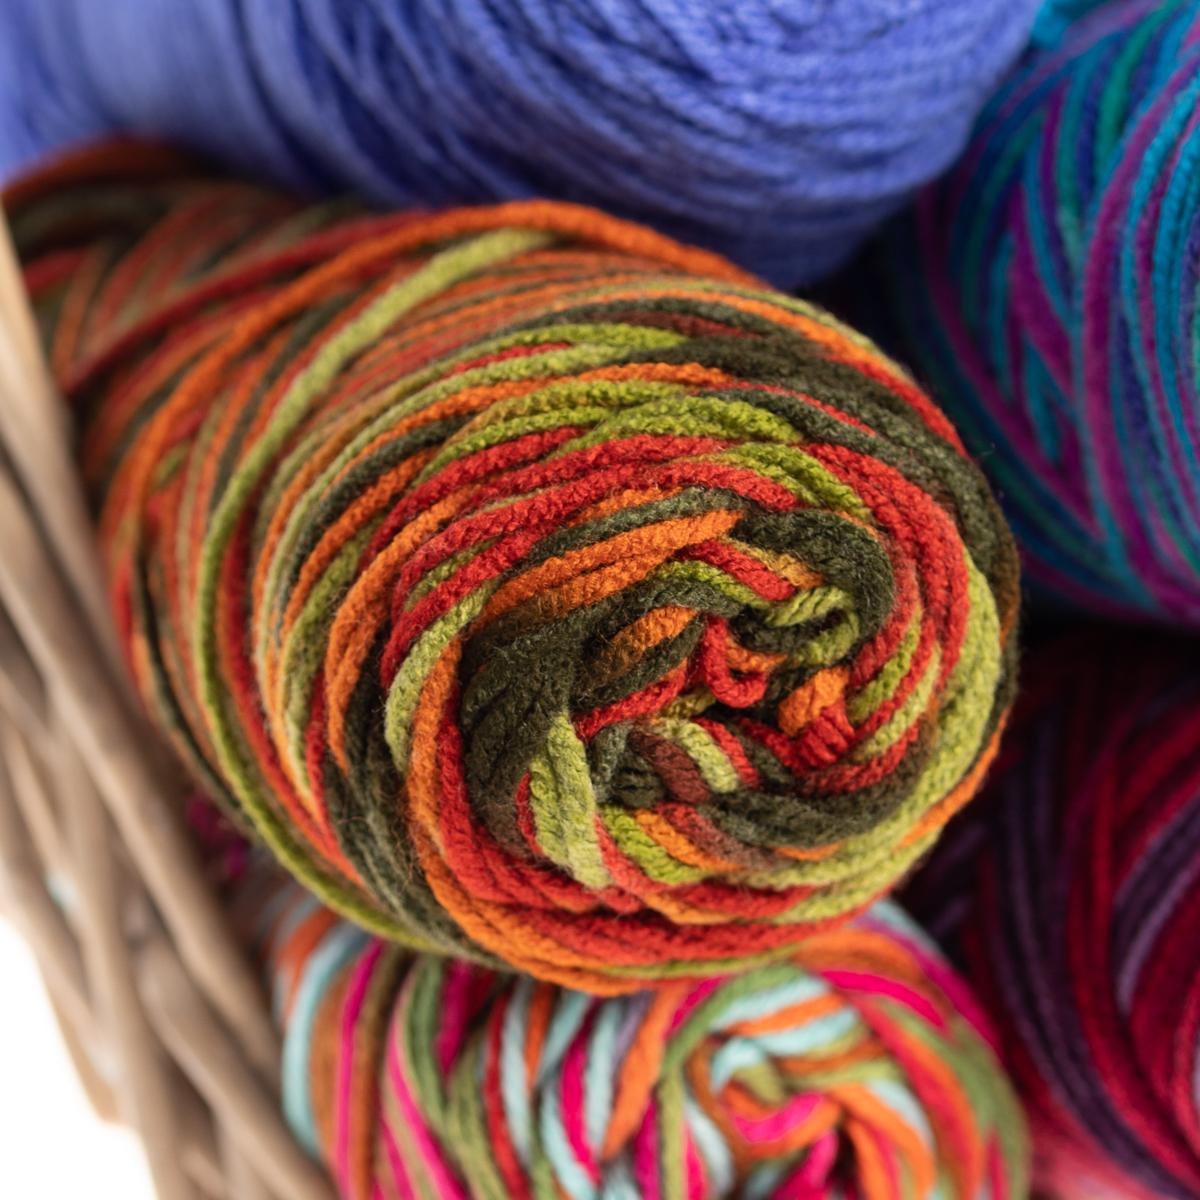 Red-Heart-With-Love-100-Acrylic-Yarn-Knitting-Crochet-Medium-4-Skein-Soft thumbnail 14